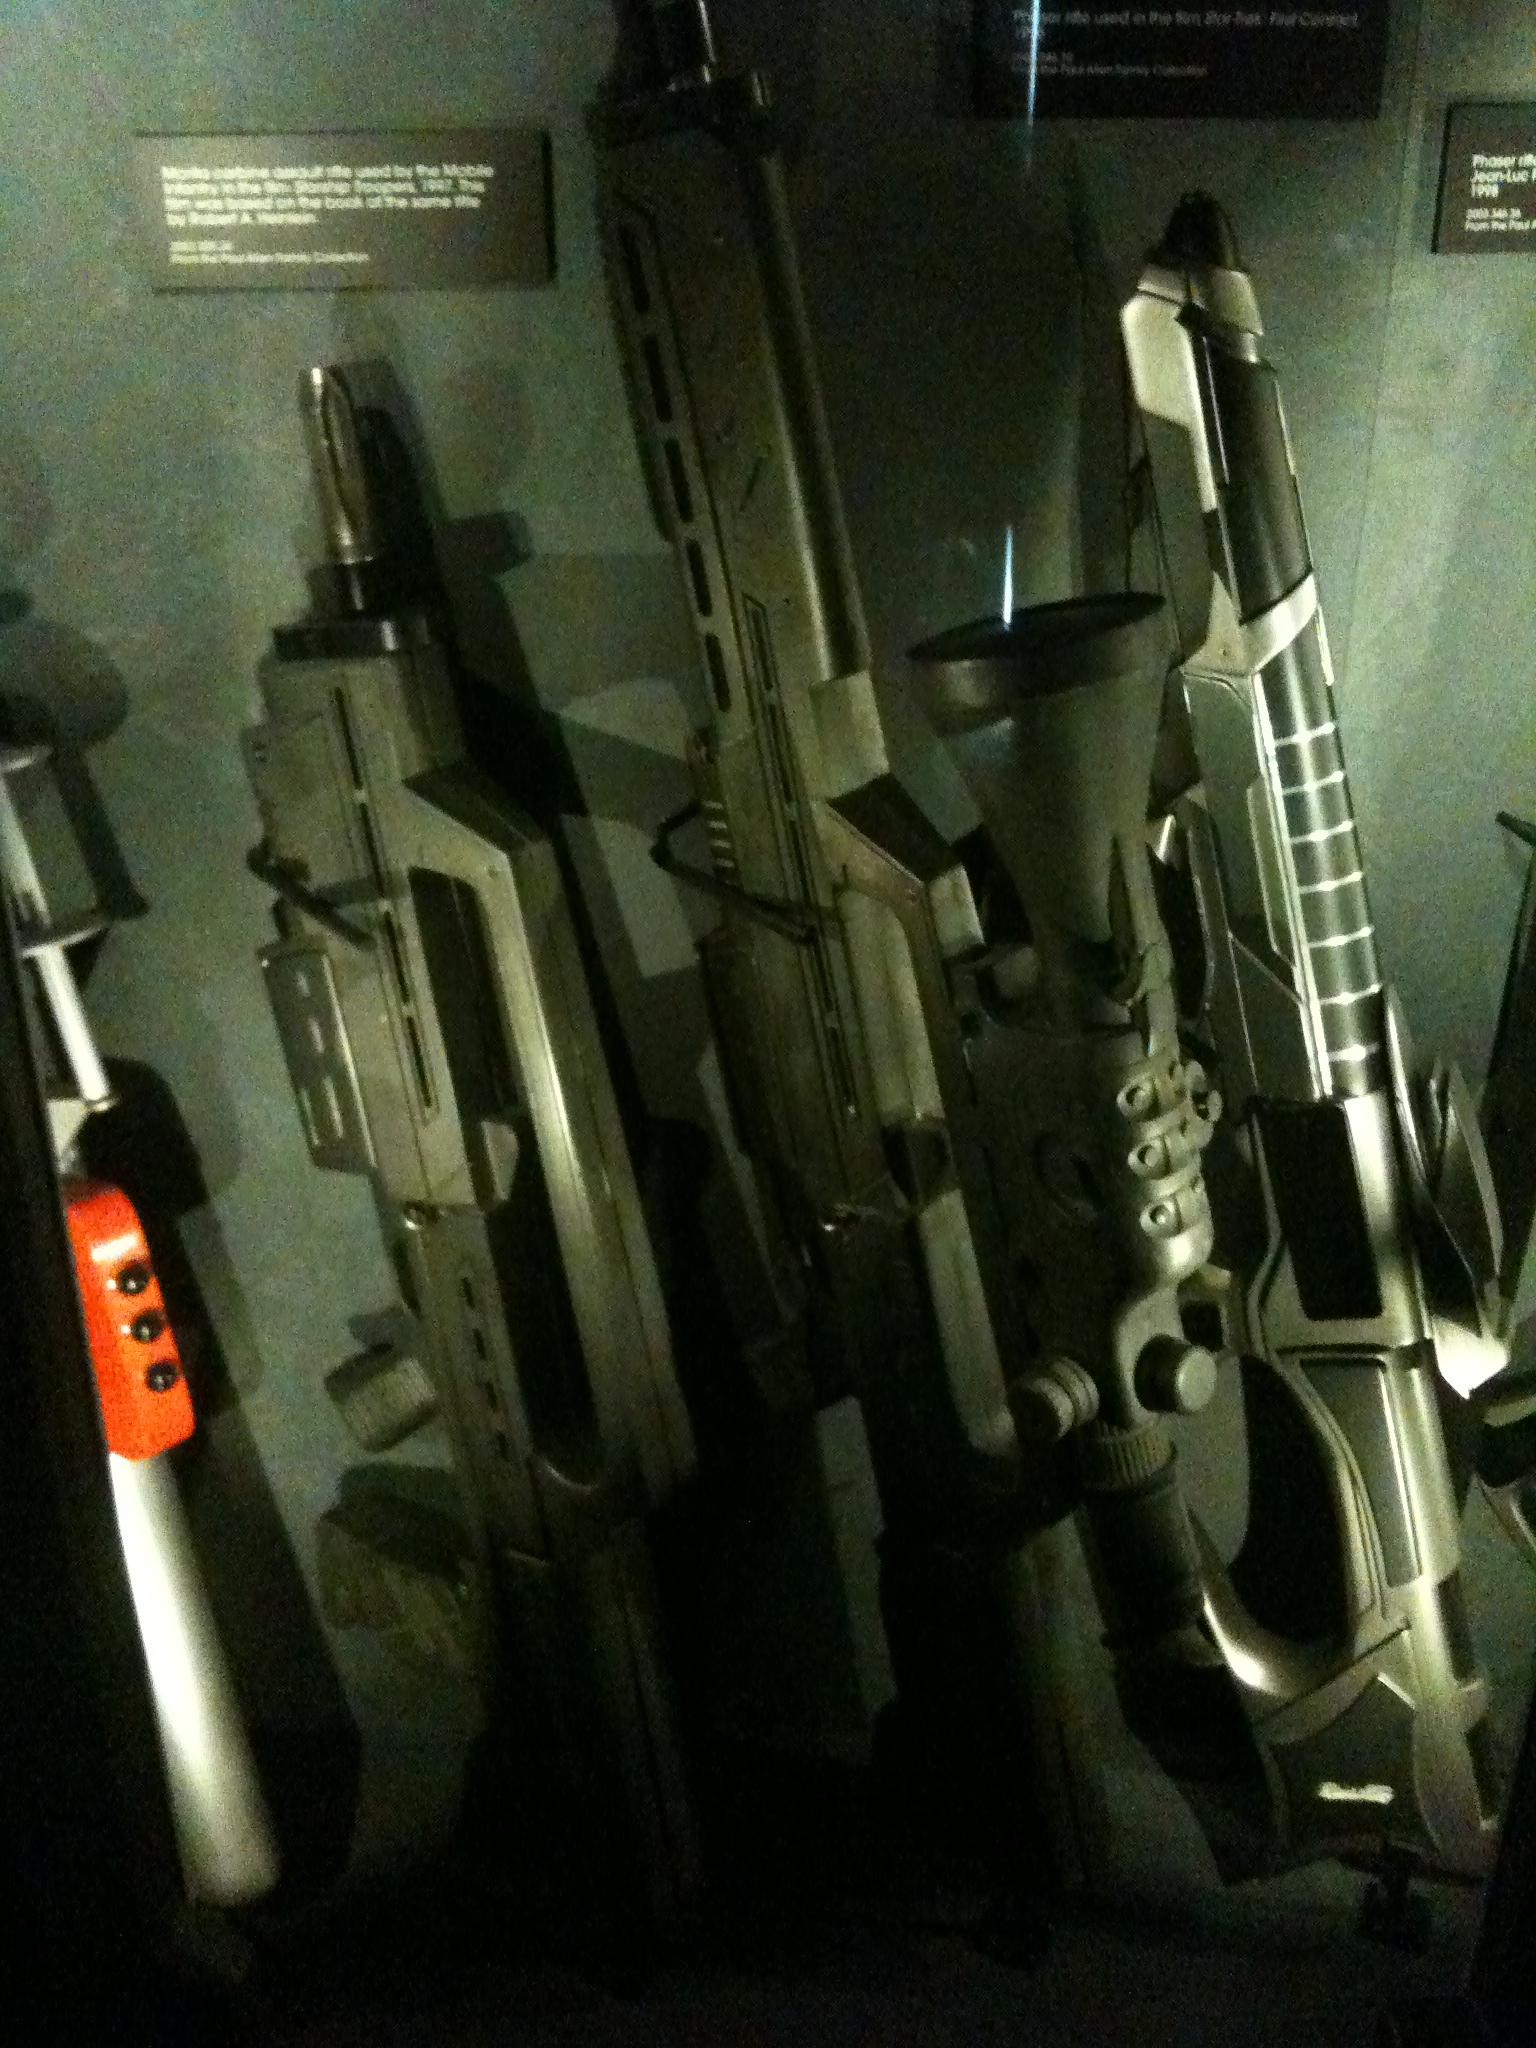 Future soldier armor concept art sci fi guns sci fi movie prop guns